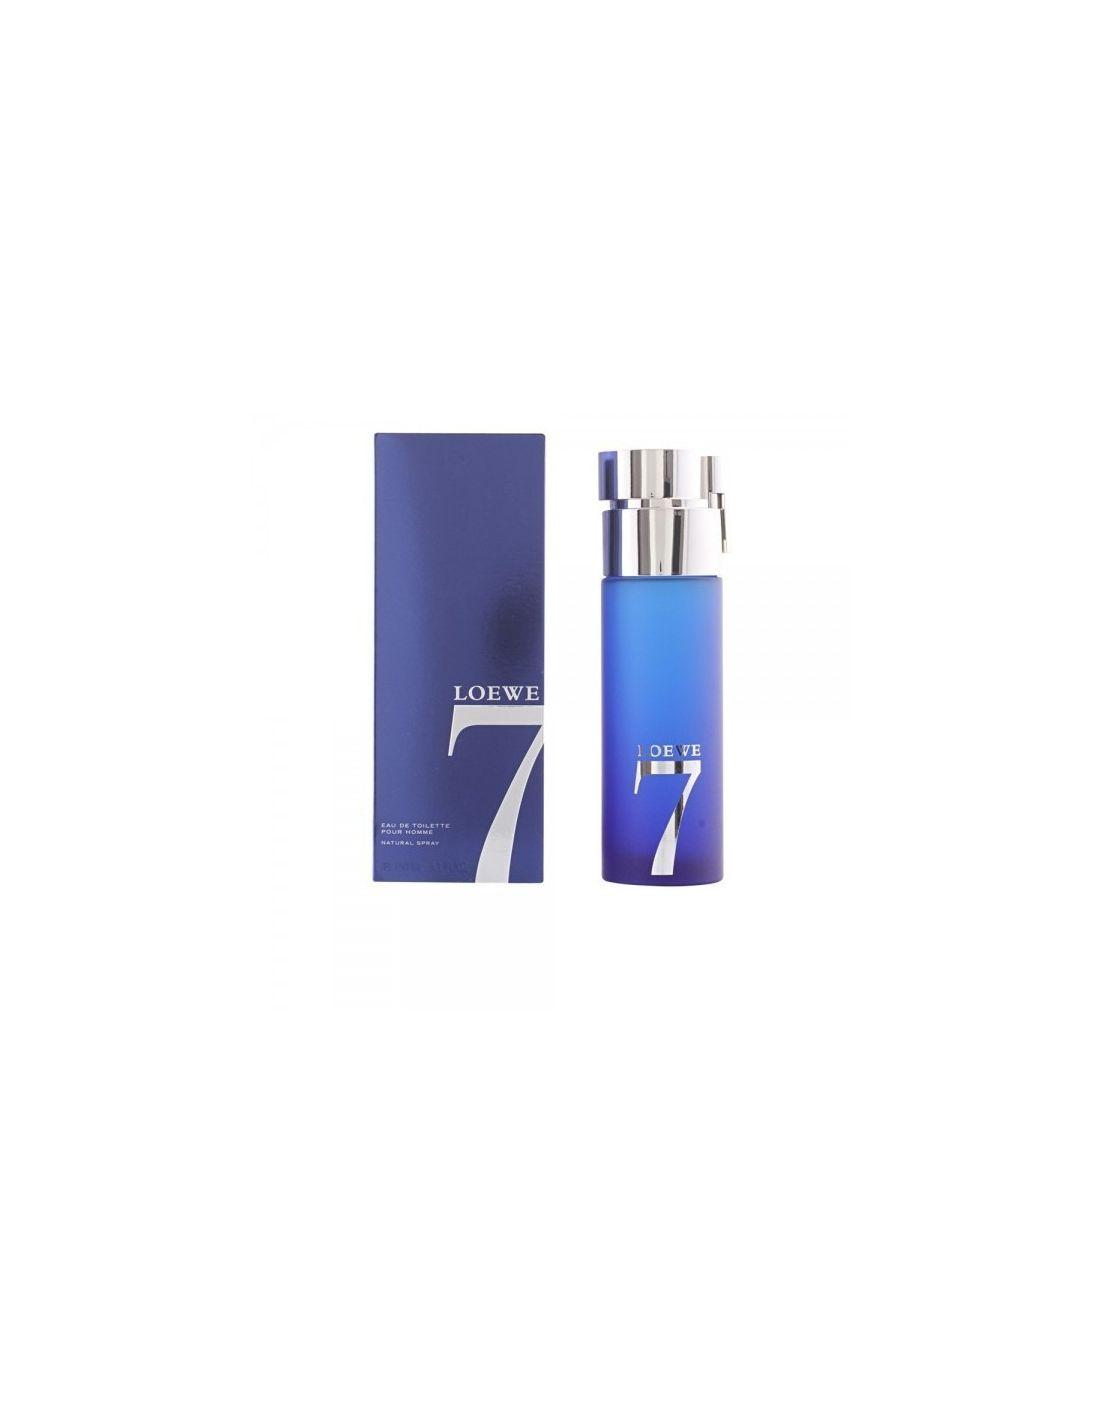 perfume loewe 7 eau de toilette 150 ml perfumes 24. Black Bedroom Furniture Sets. Home Design Ideas